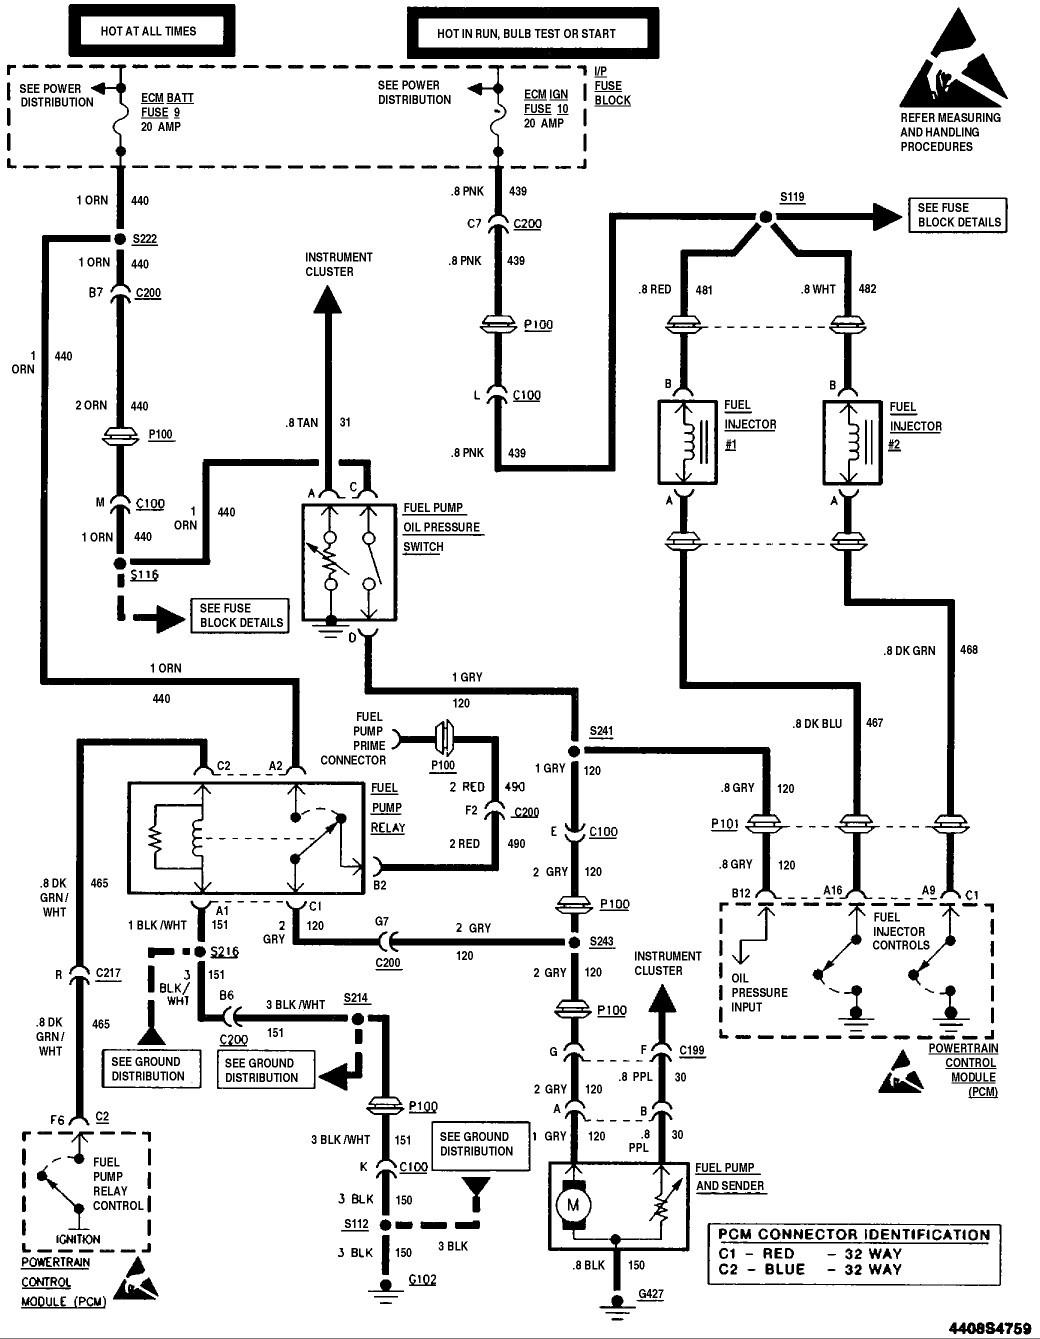 Image template 95 s10 alternator wiring diagram 2001 fuel pump